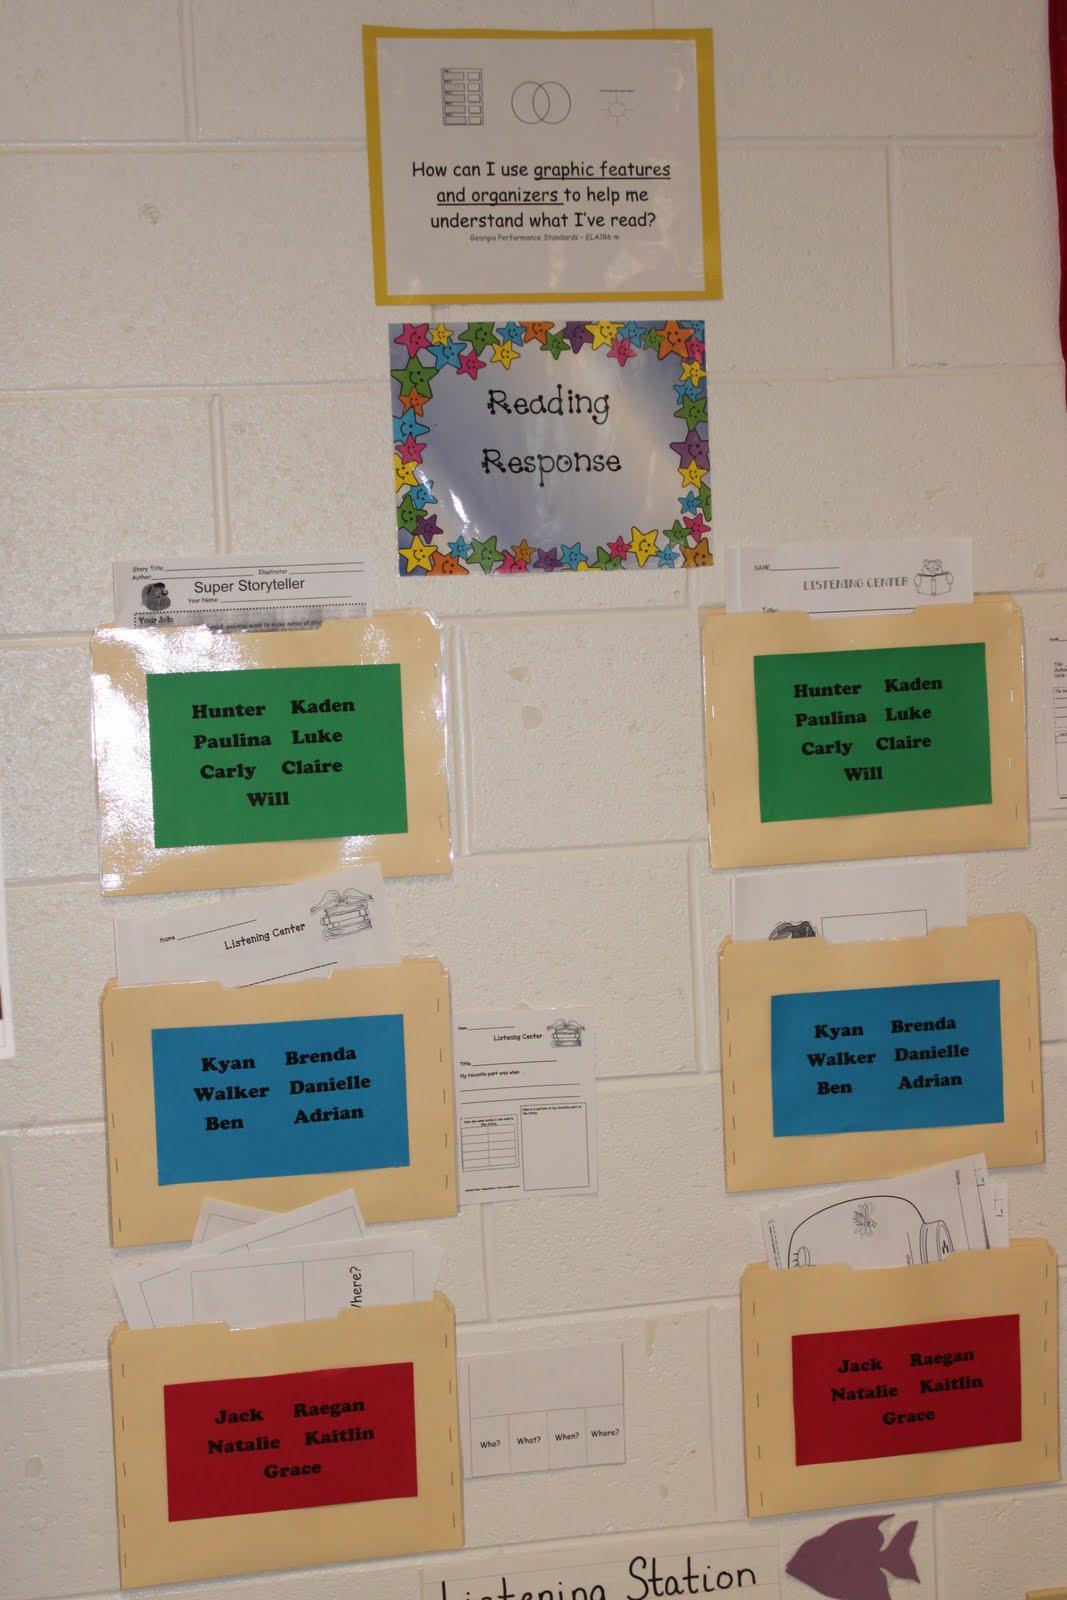 Reading Response Station